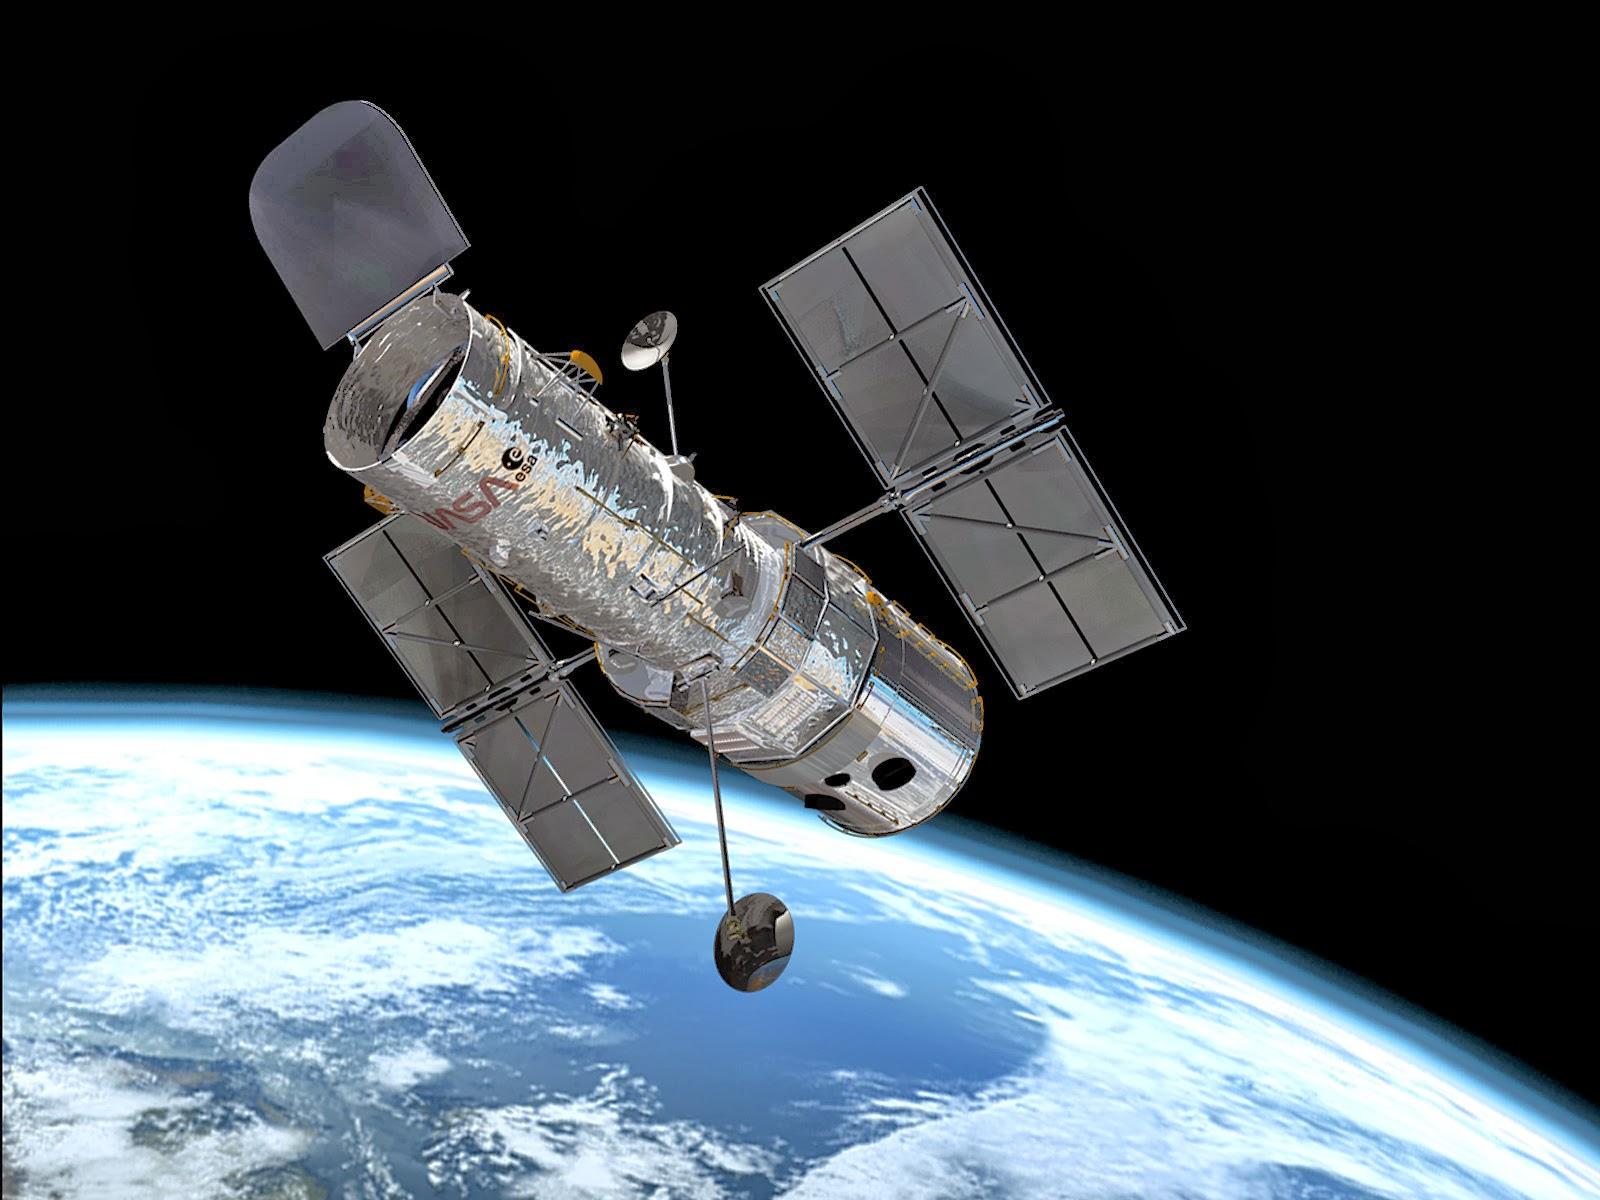 Suburban Spaceman Nasa Hubble Space Telescope Rescue Story